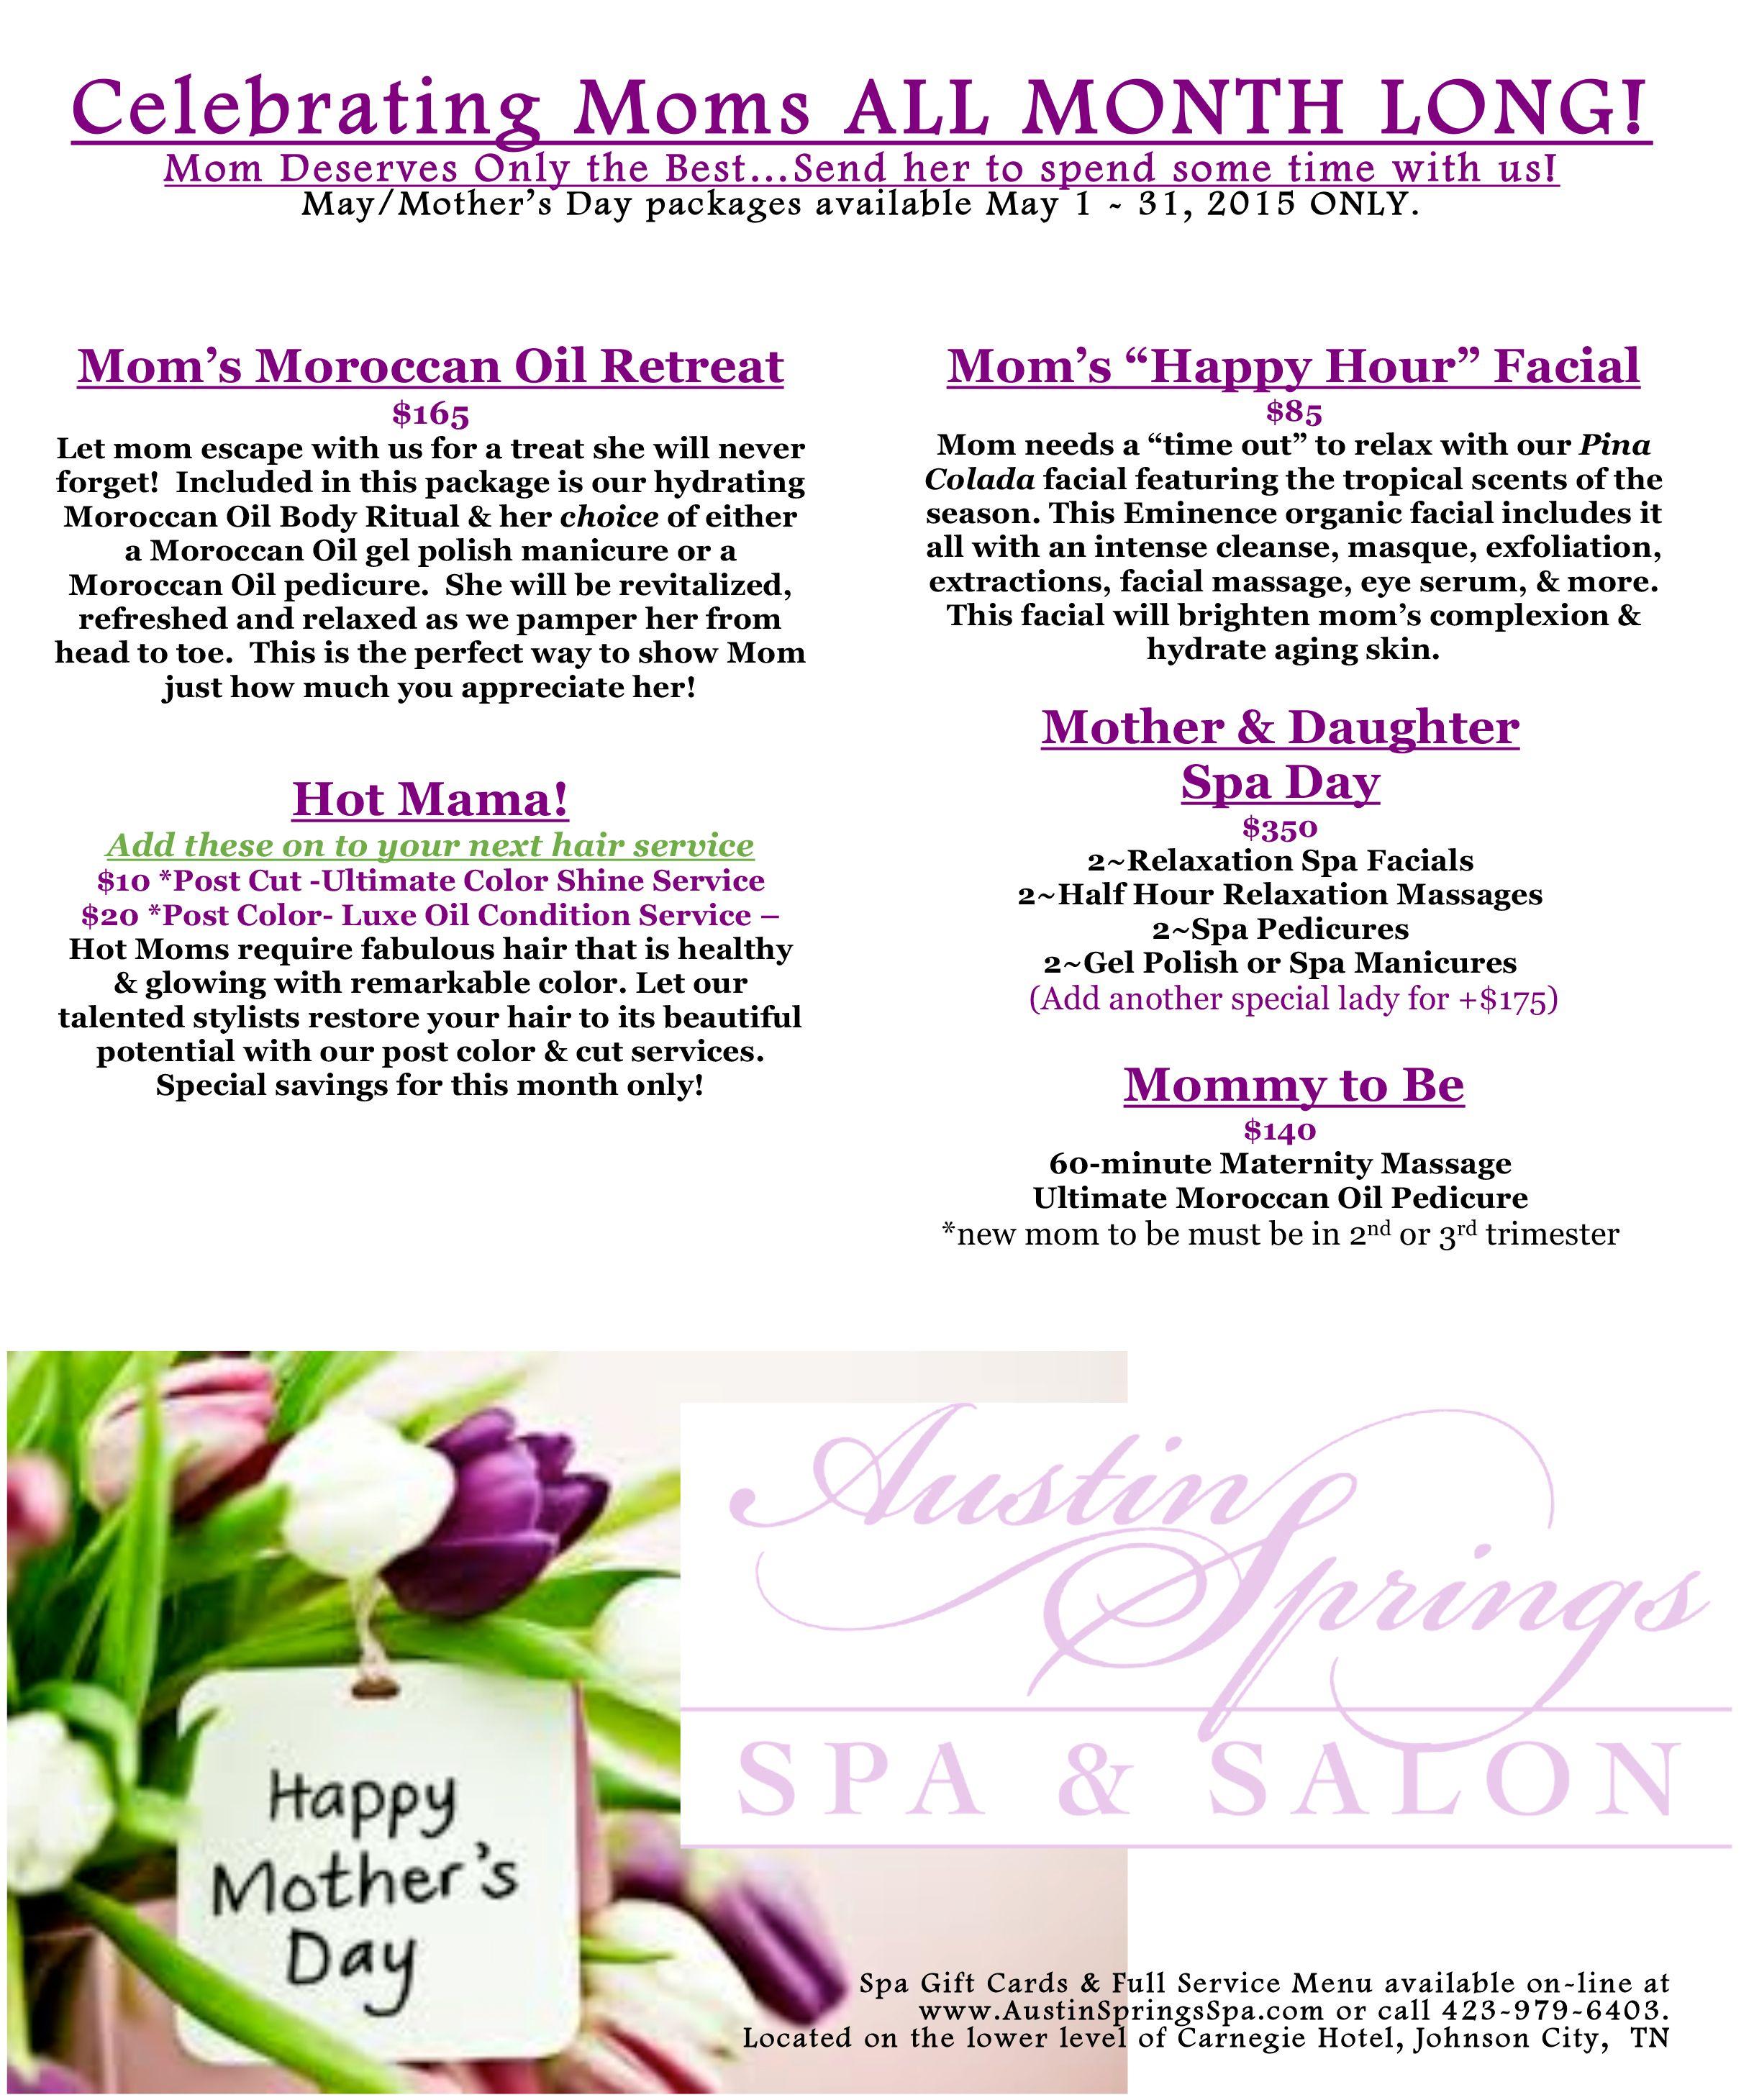 Austin Springs Spa Spa Specials Salon Promotions Spring Spa